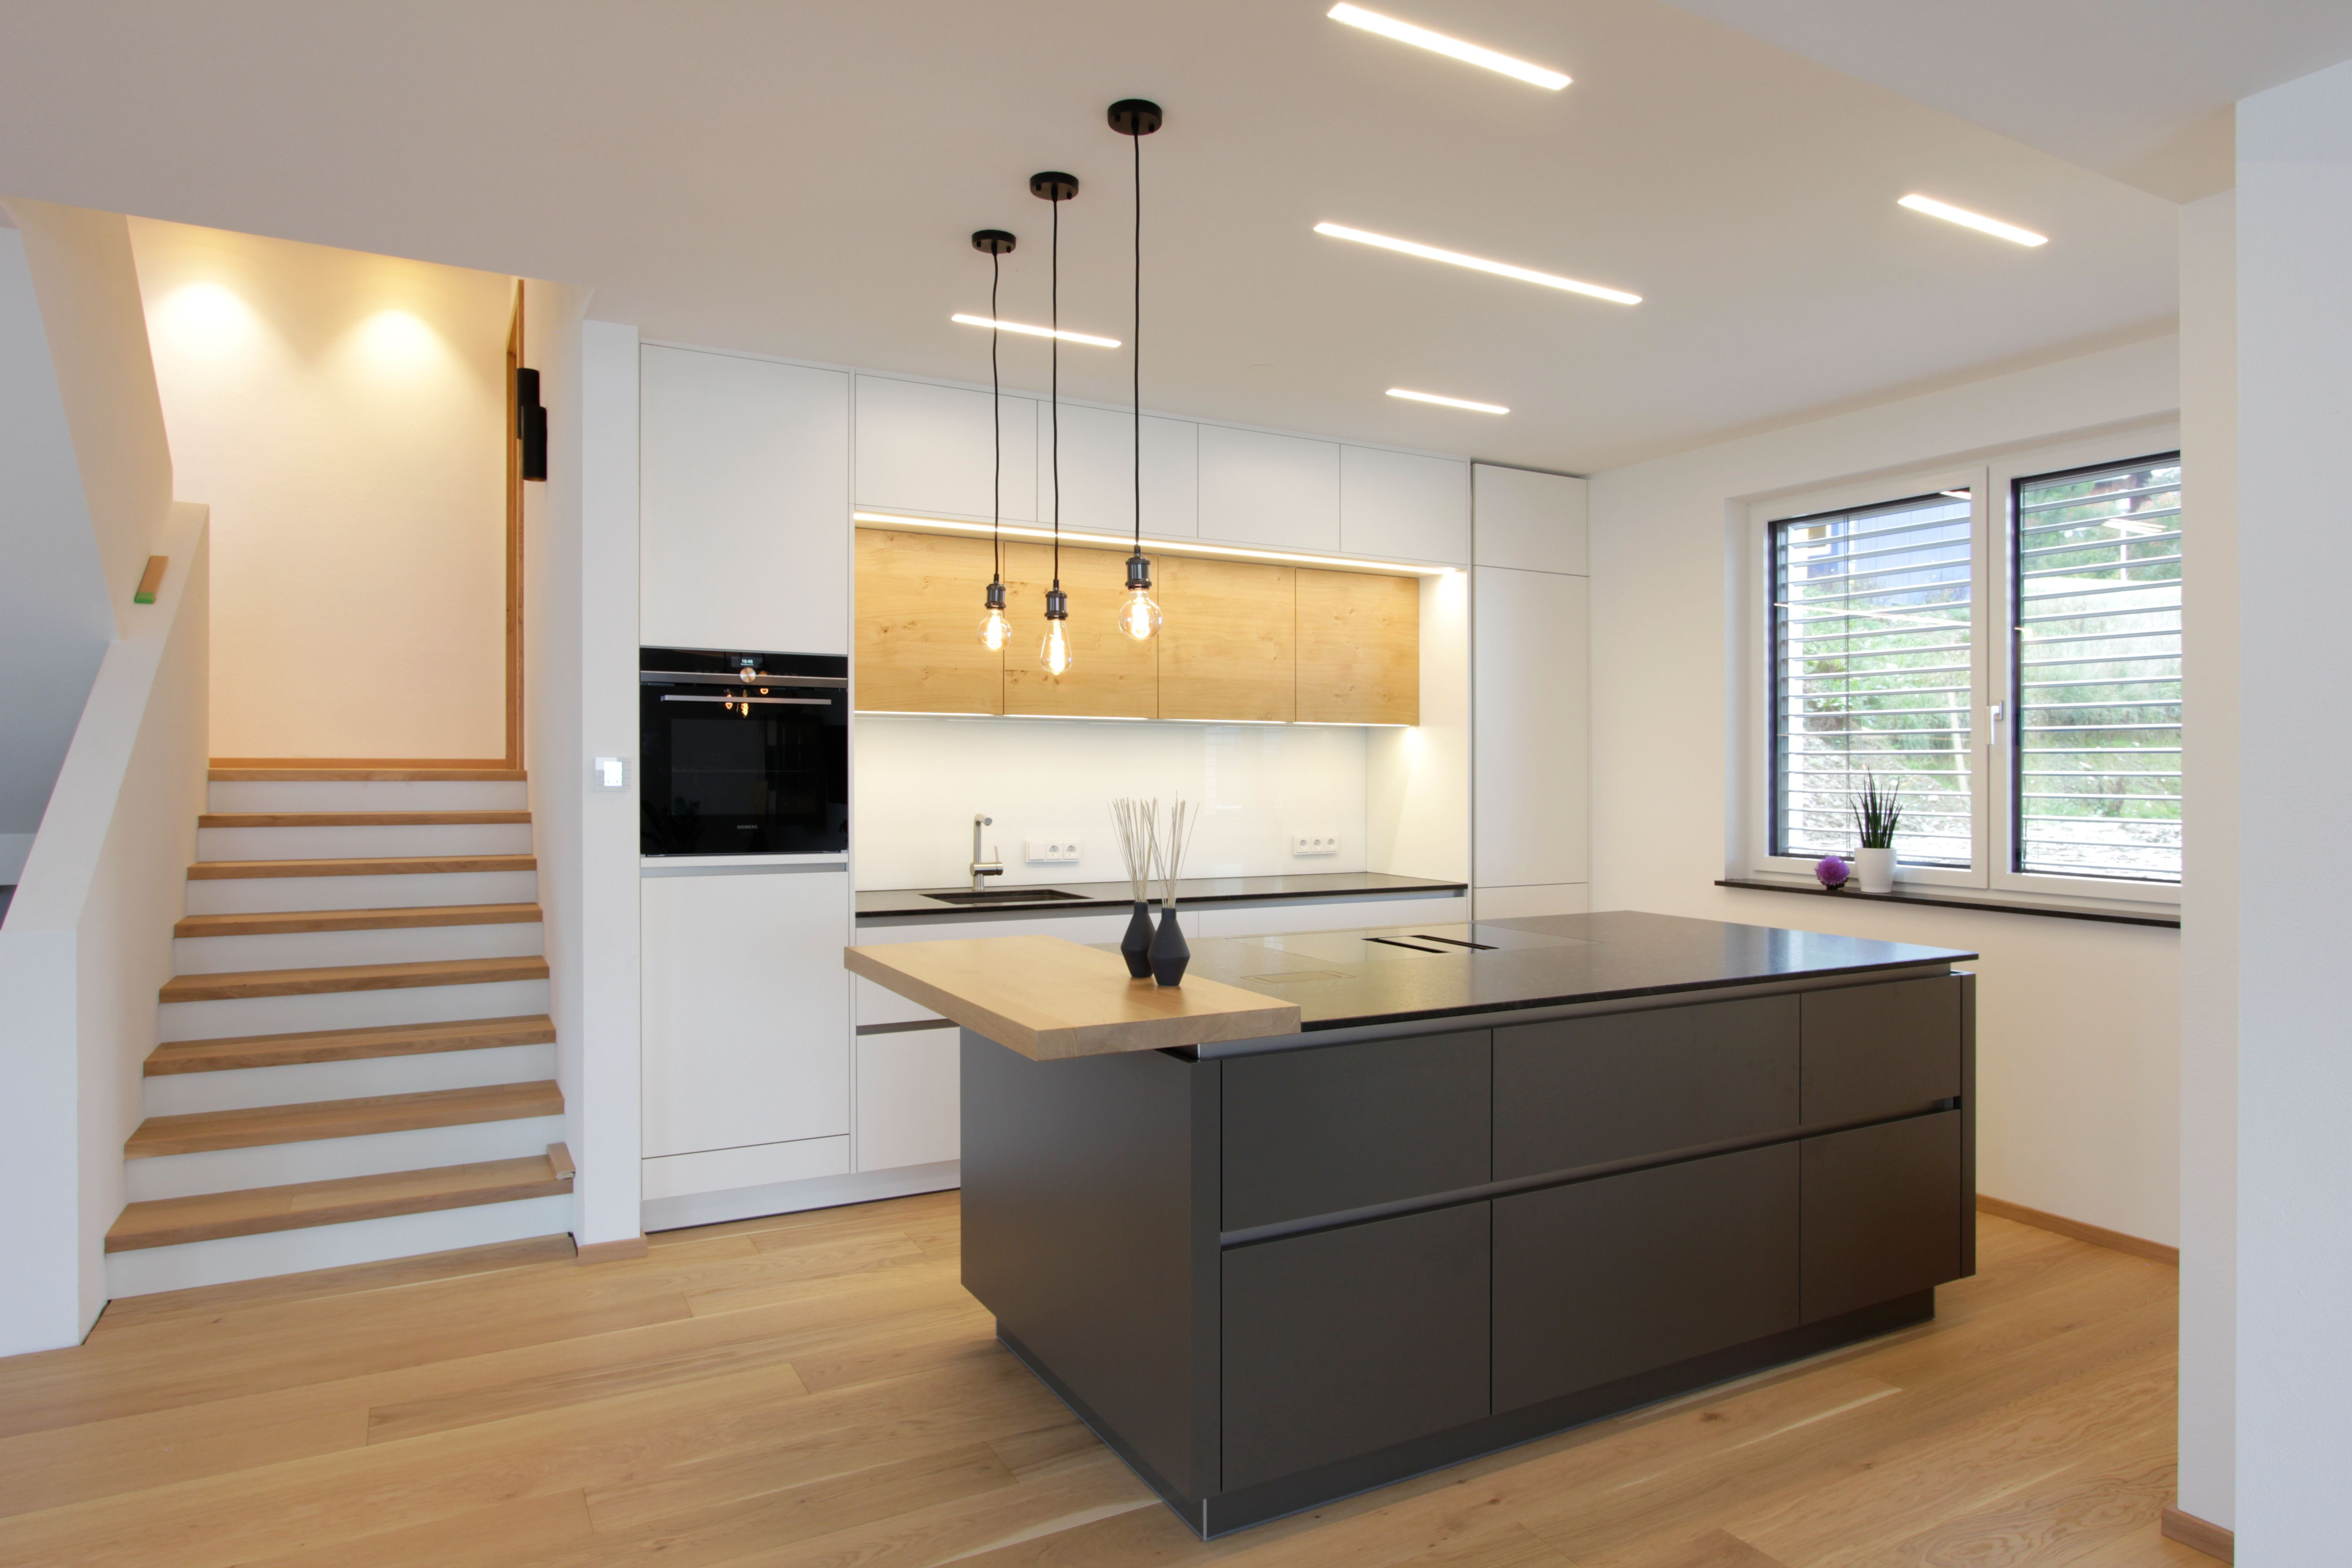 Moderne Kuche Mit Holz Moderne Graue Kuche Moderne Kuche Innenarchitektur Kuche